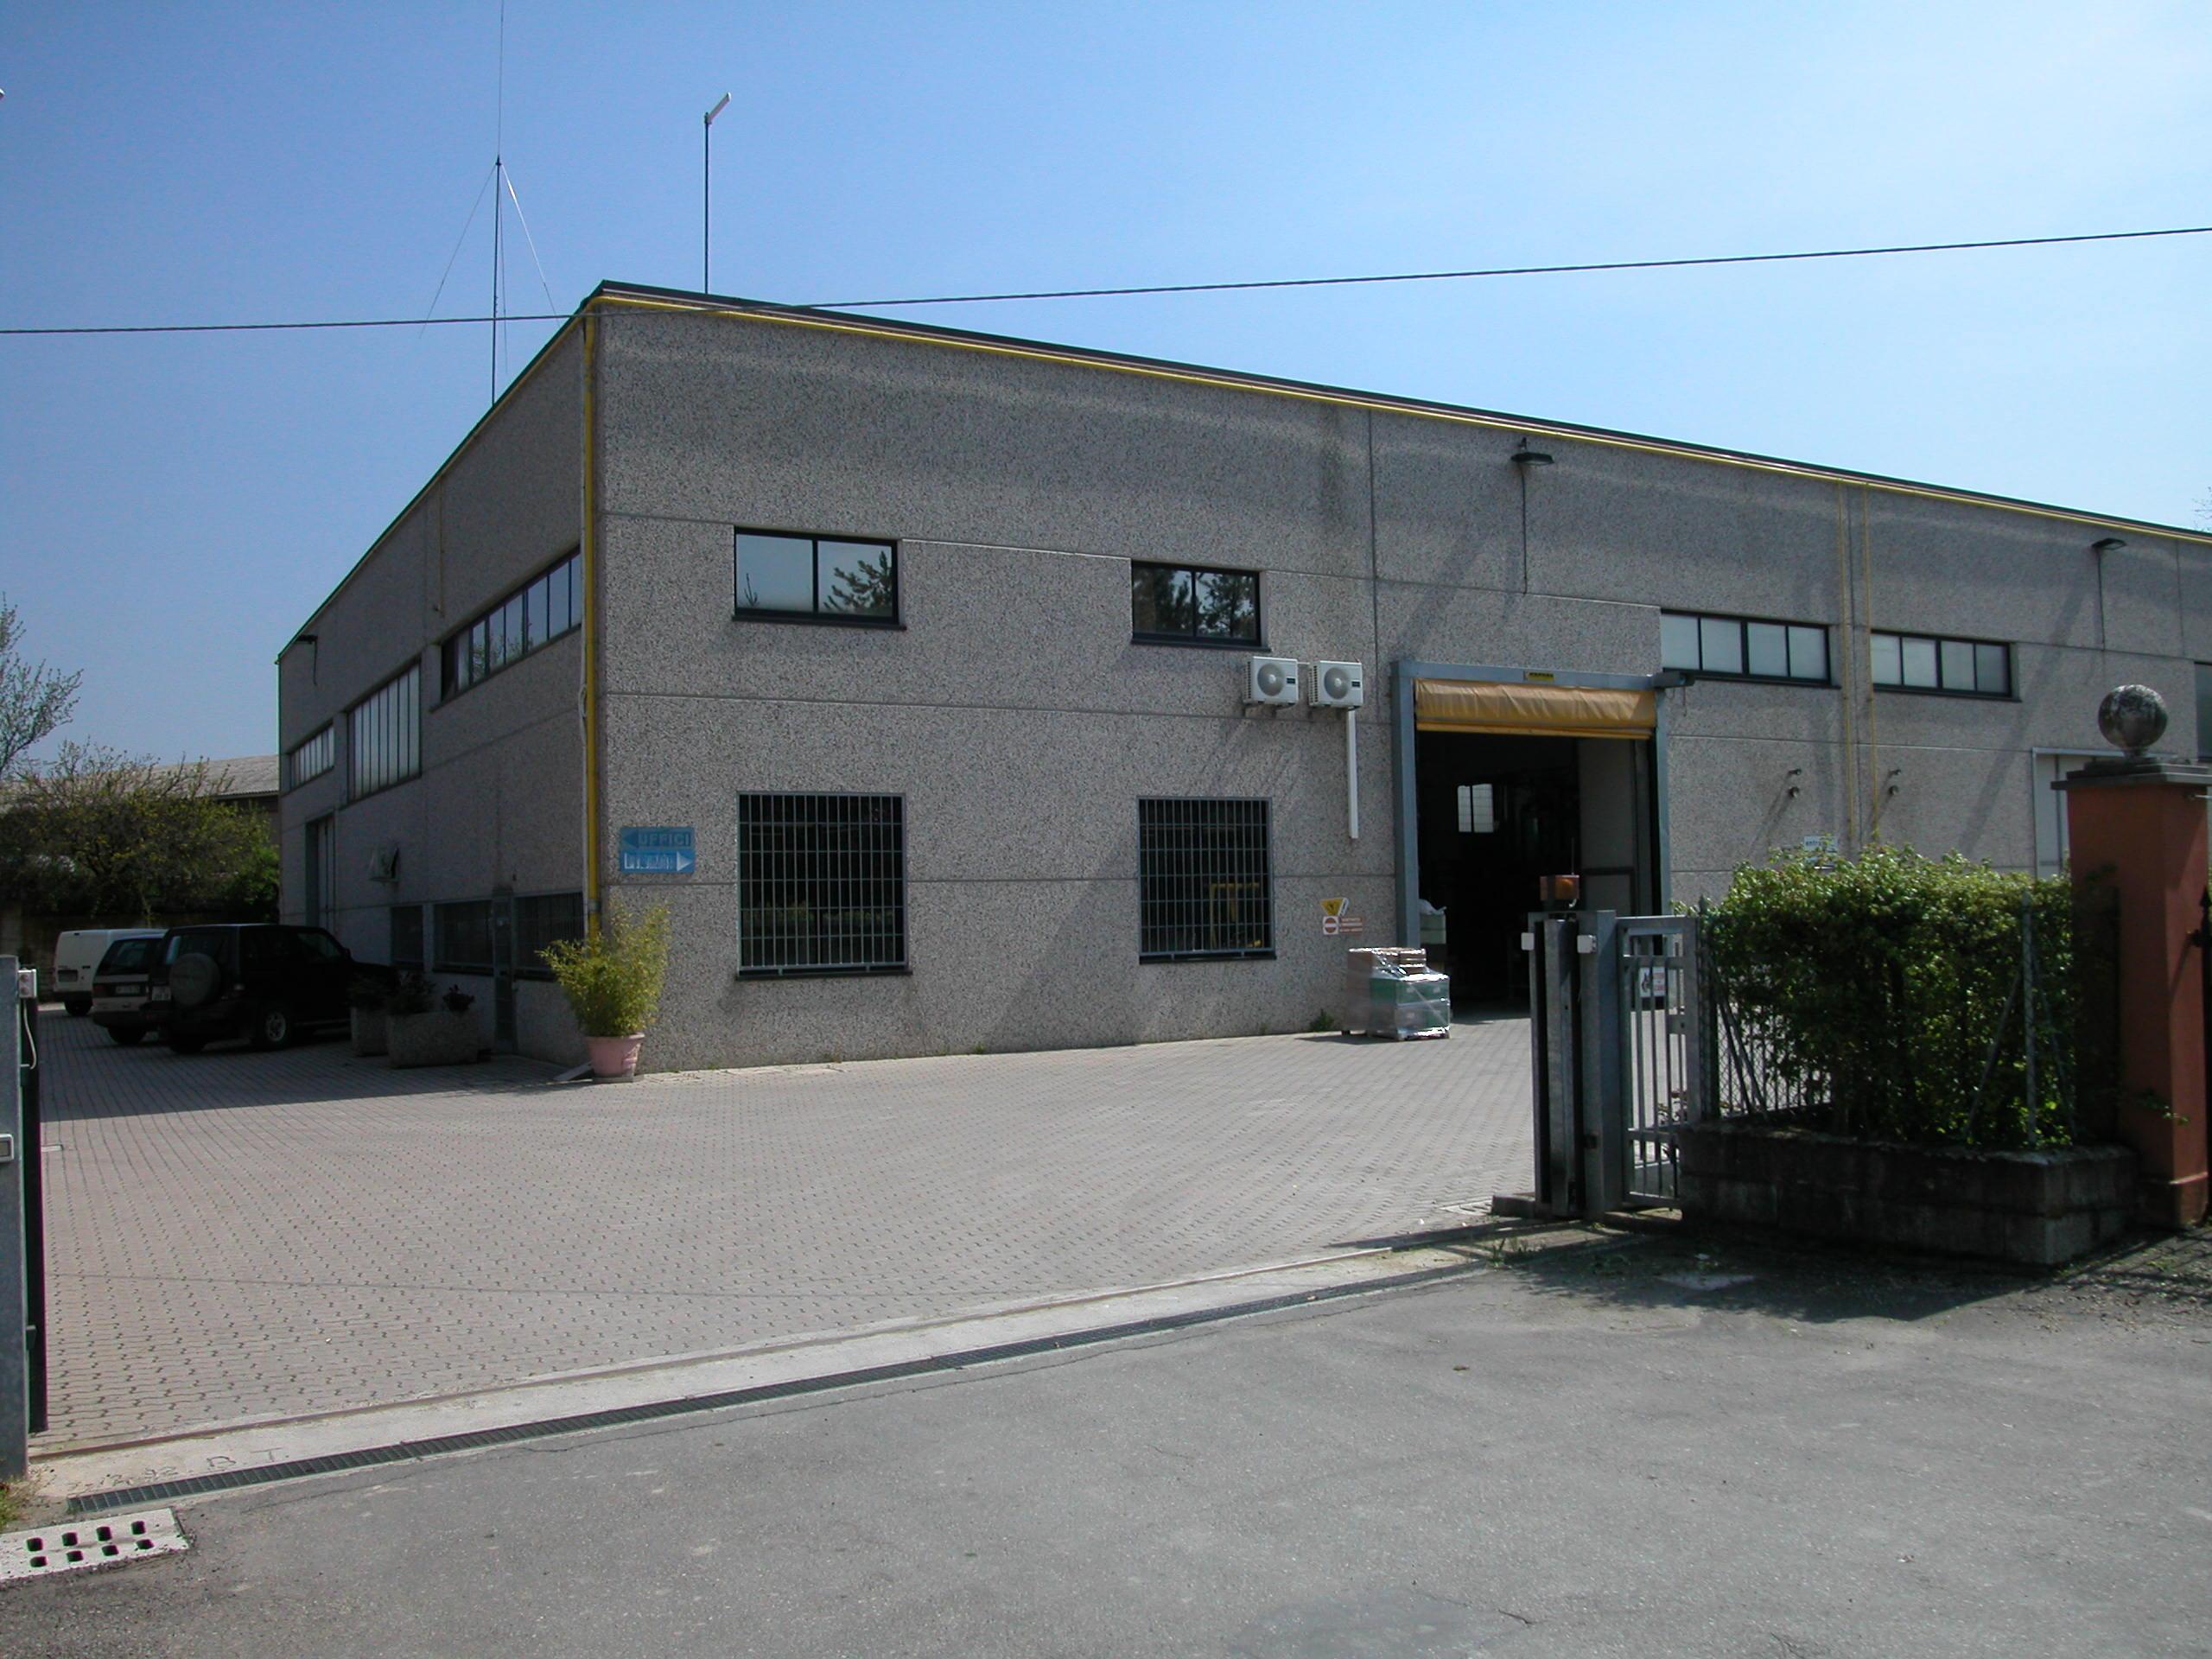 Azienda Lamipress